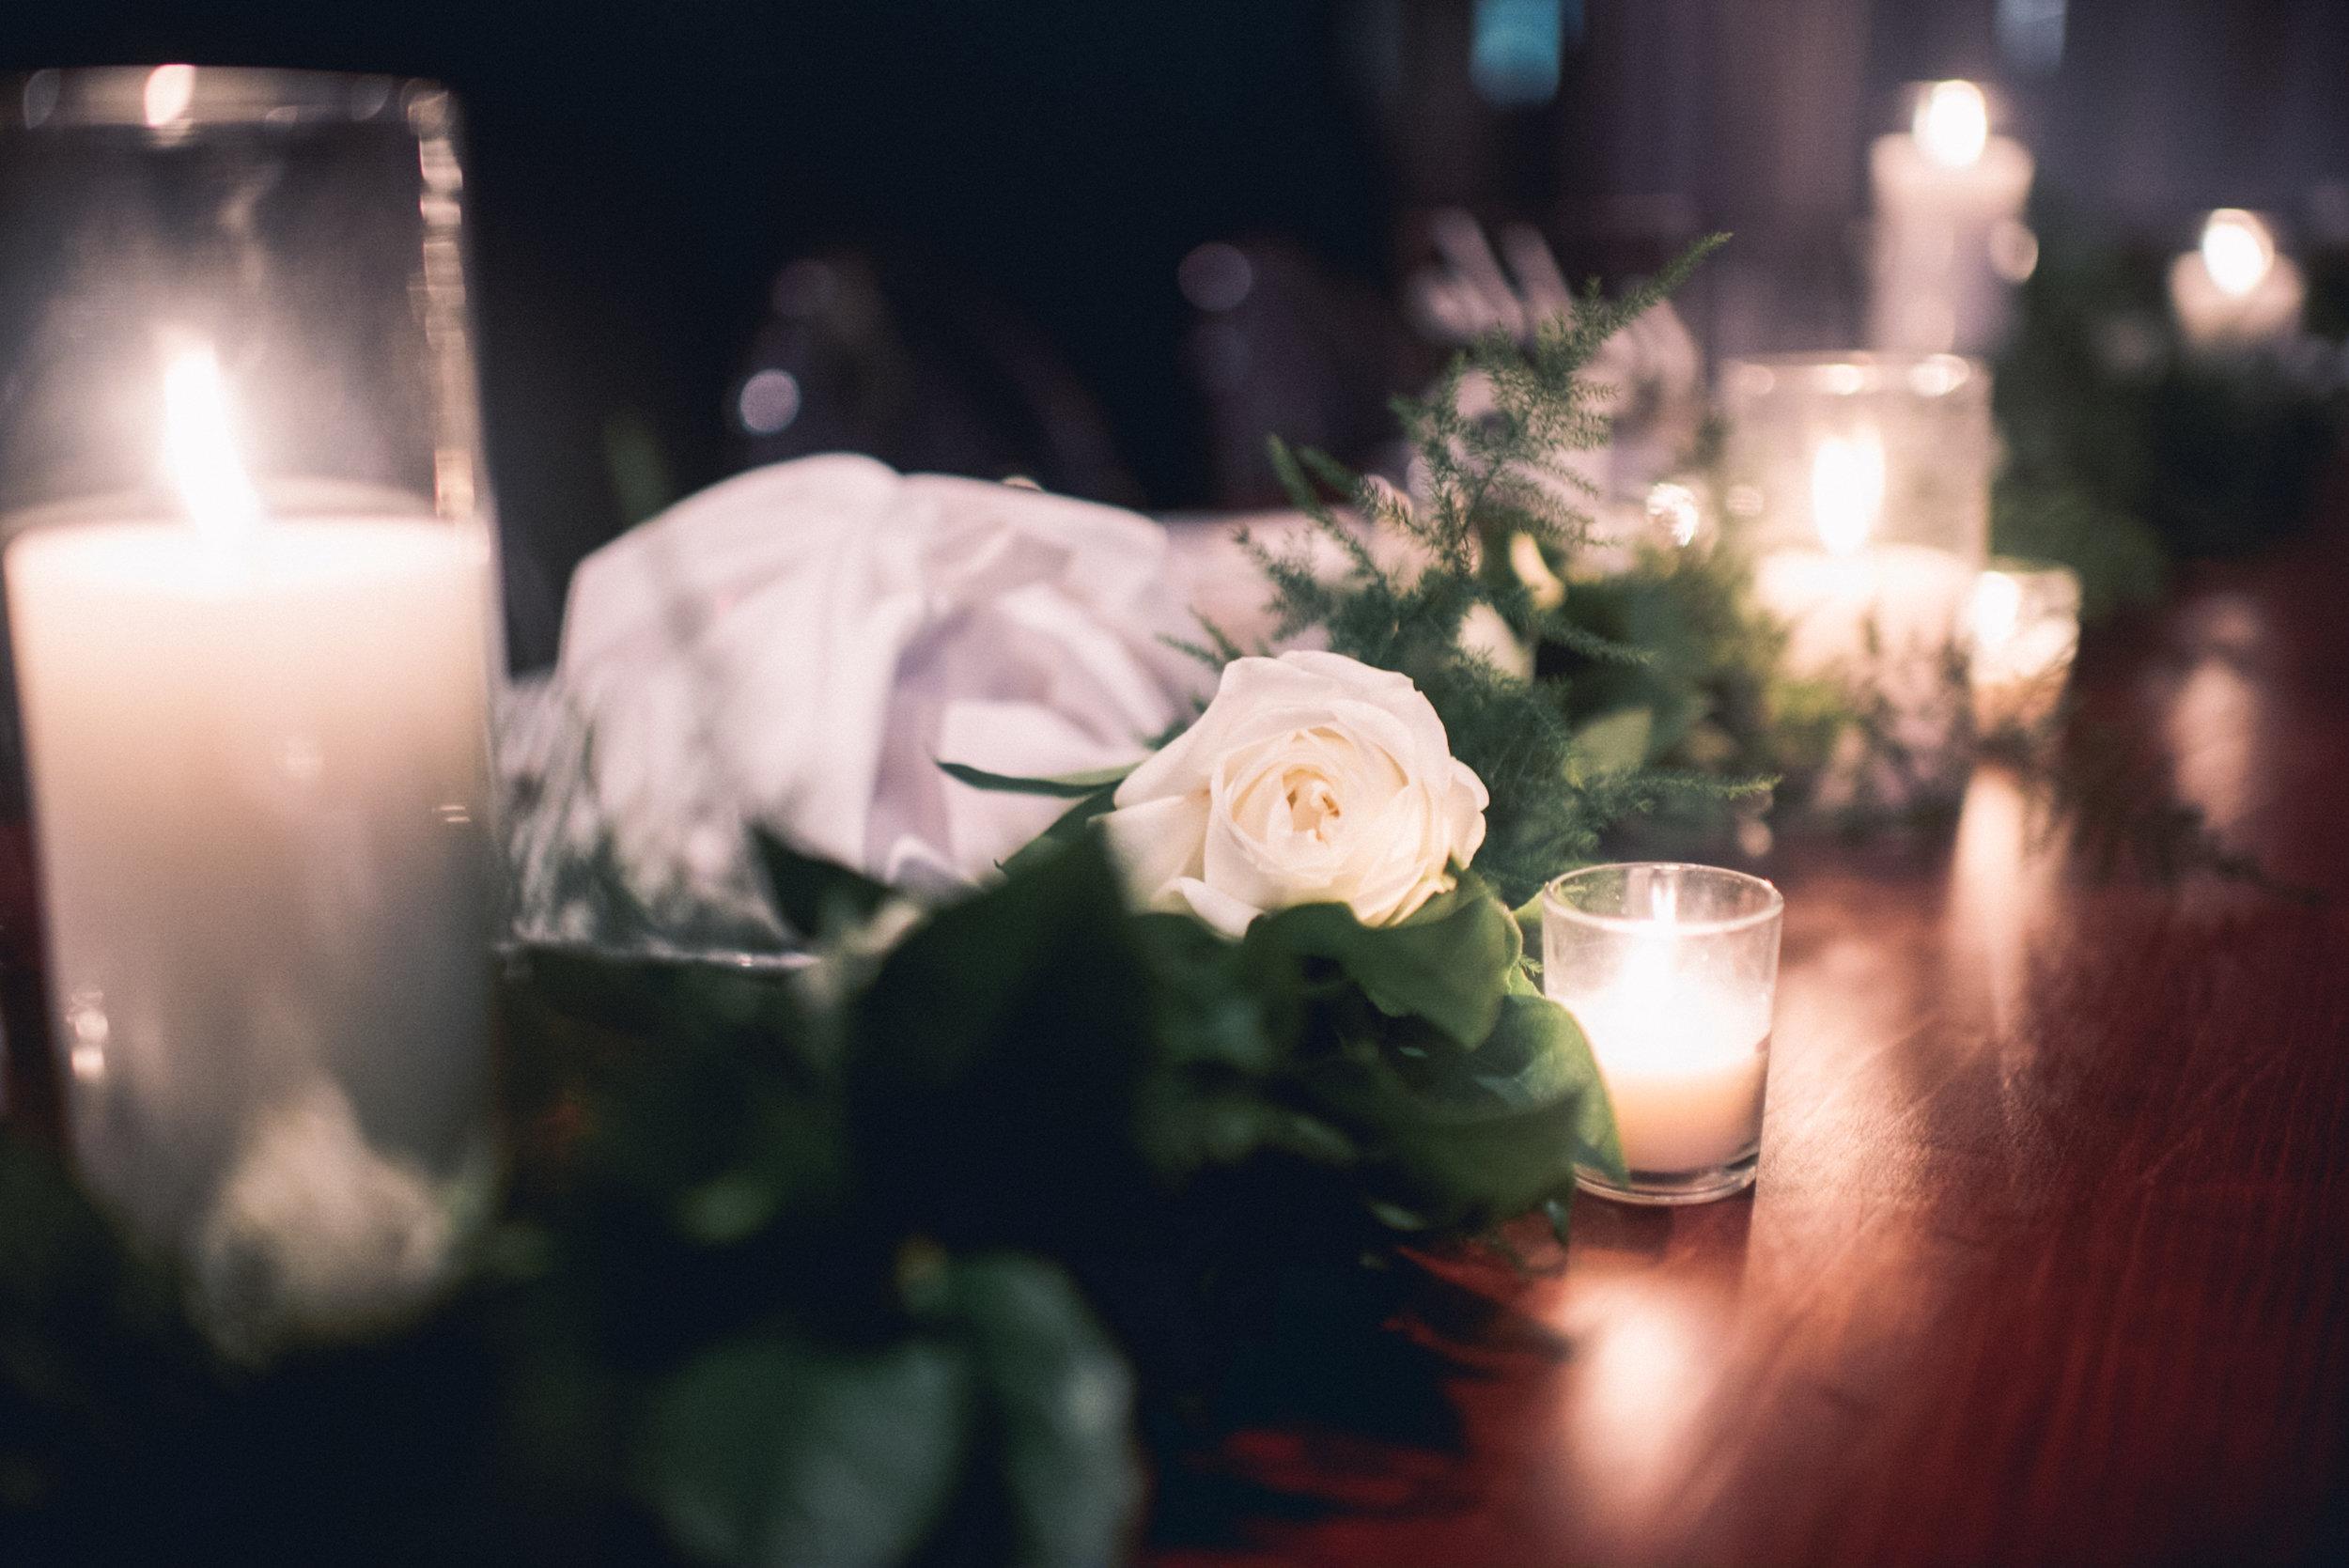 Pittsburgh Pennsylvania New York NYC Wedding Photographer Photojournalist Luxury Downtown Opera - Stirpe 1136.jpg